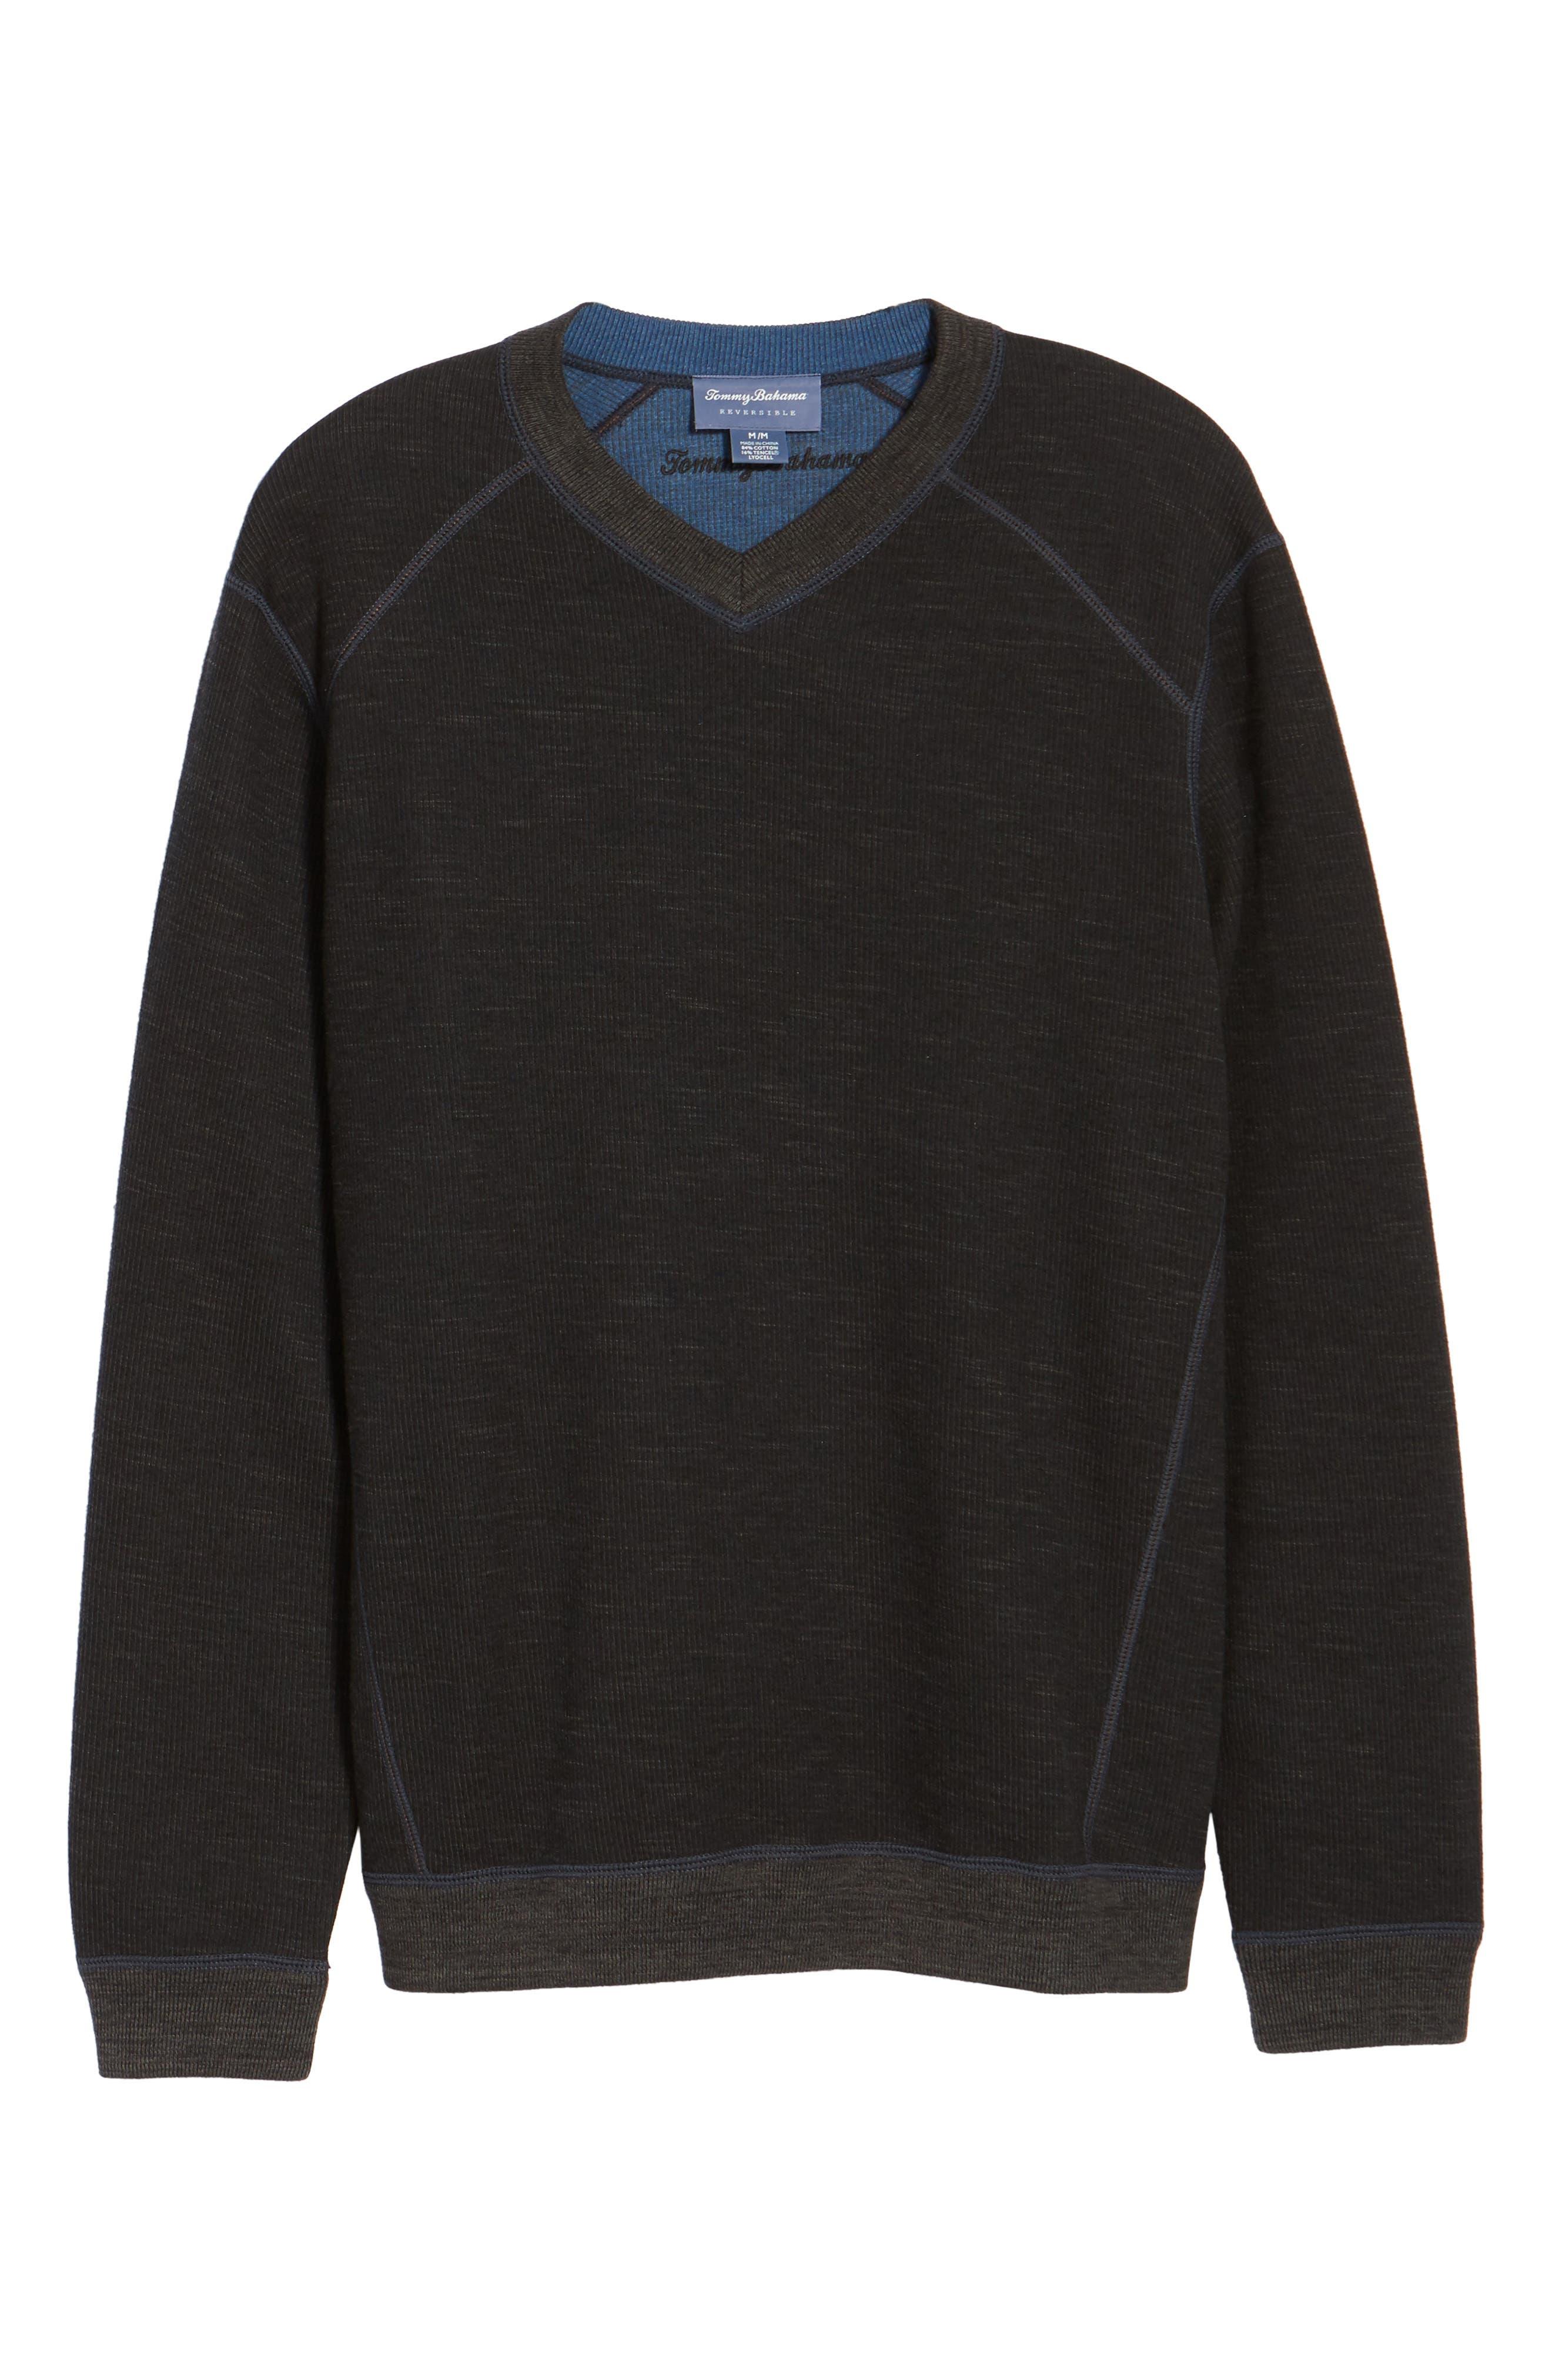 Flipside Pro Reversible Sweatshirt,                             Alternate thumbnail 6, color,                             001